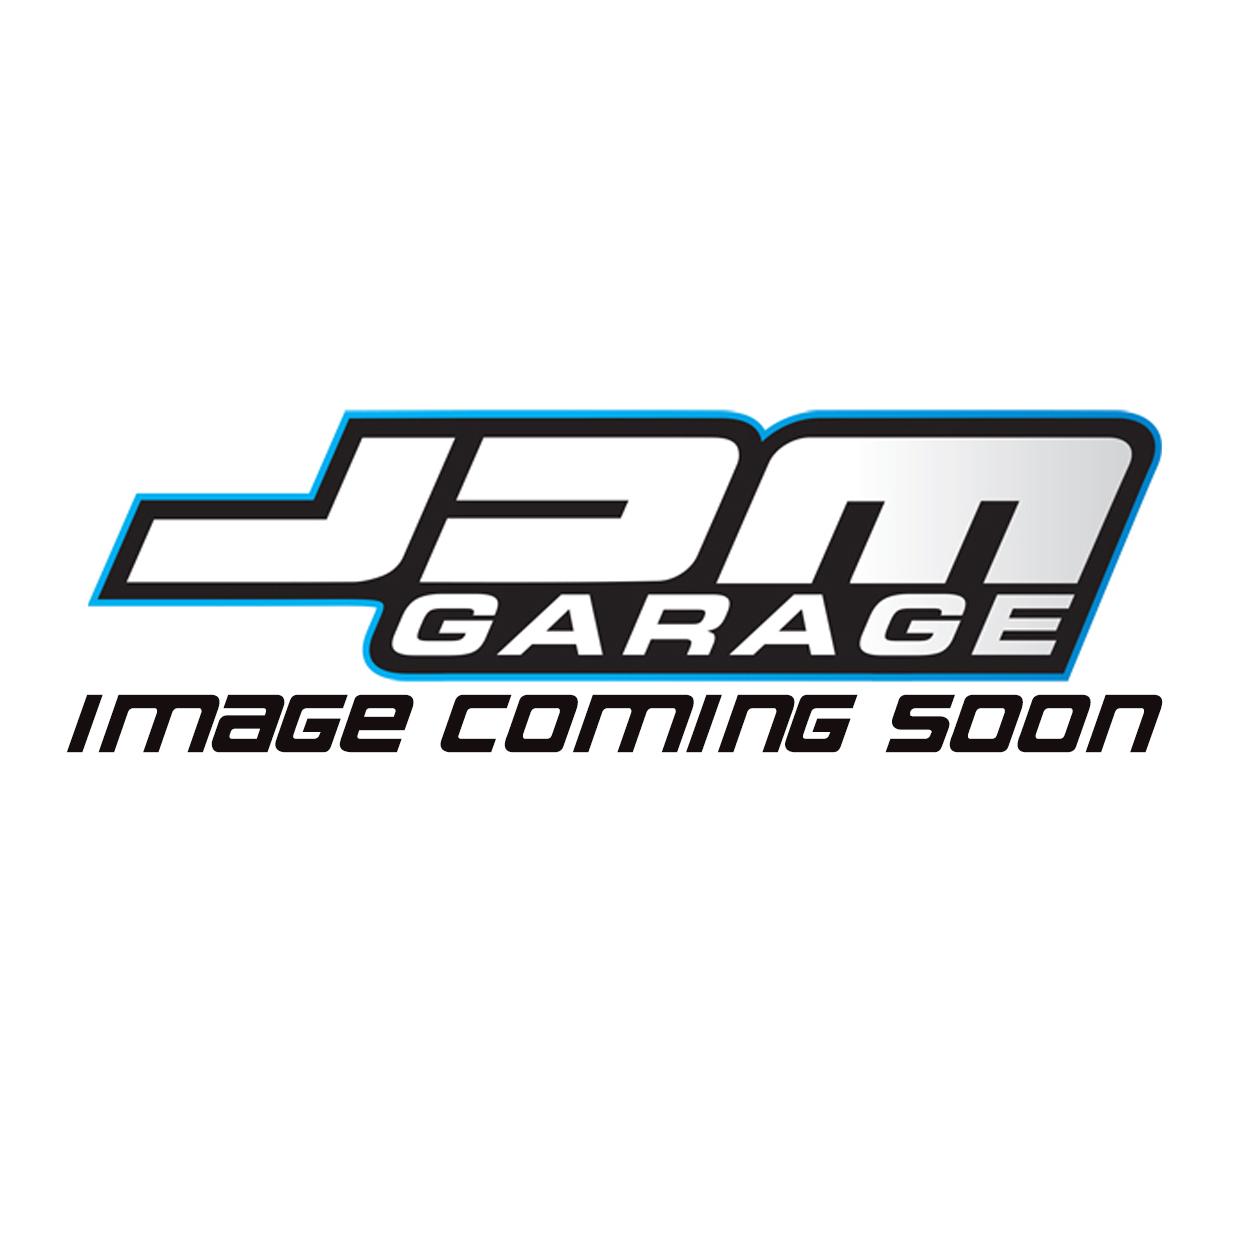 Genuine Nissan Replacement Cambelt Kit With Tensioner & Idler For Nissan Skyline Cefiro Laurel RB25DE / DET